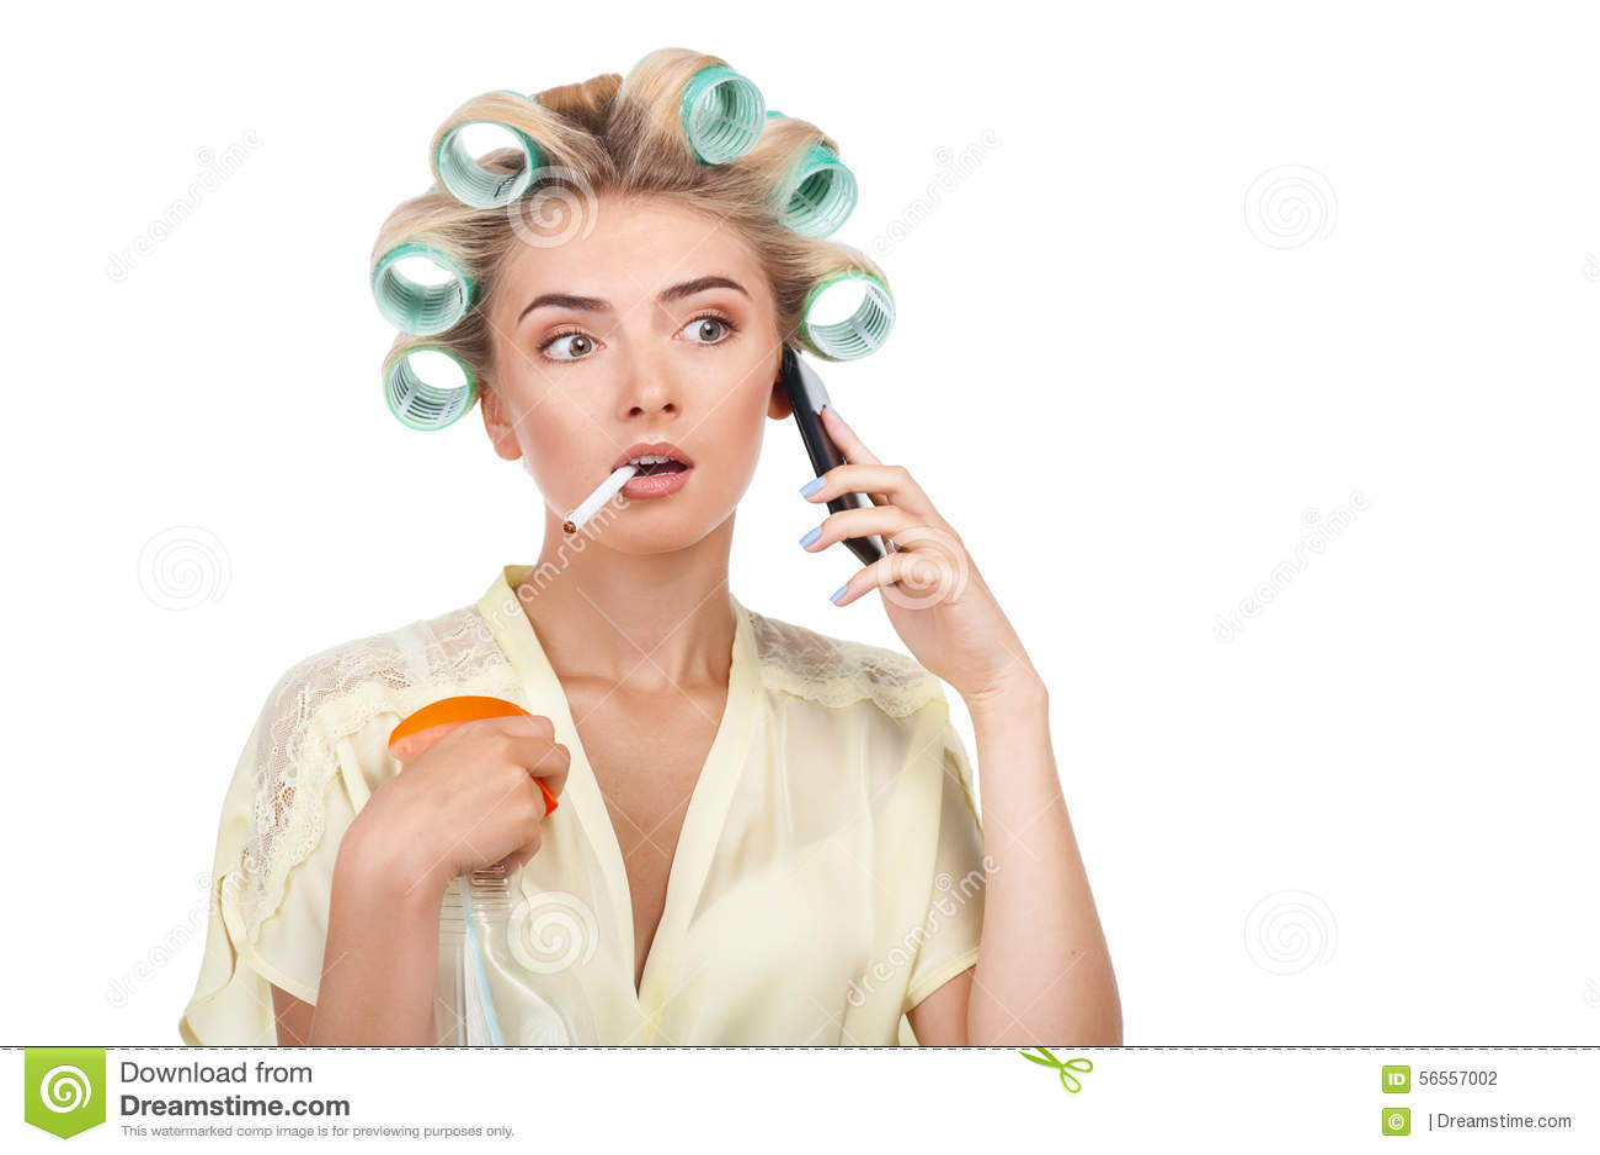 Download Η αρκετά νέα γυναίκα μιλά στο τηλέφωνο και Στοκ Εικόνες - εικόνα από καλλιέργεια, υγιής: 56557002